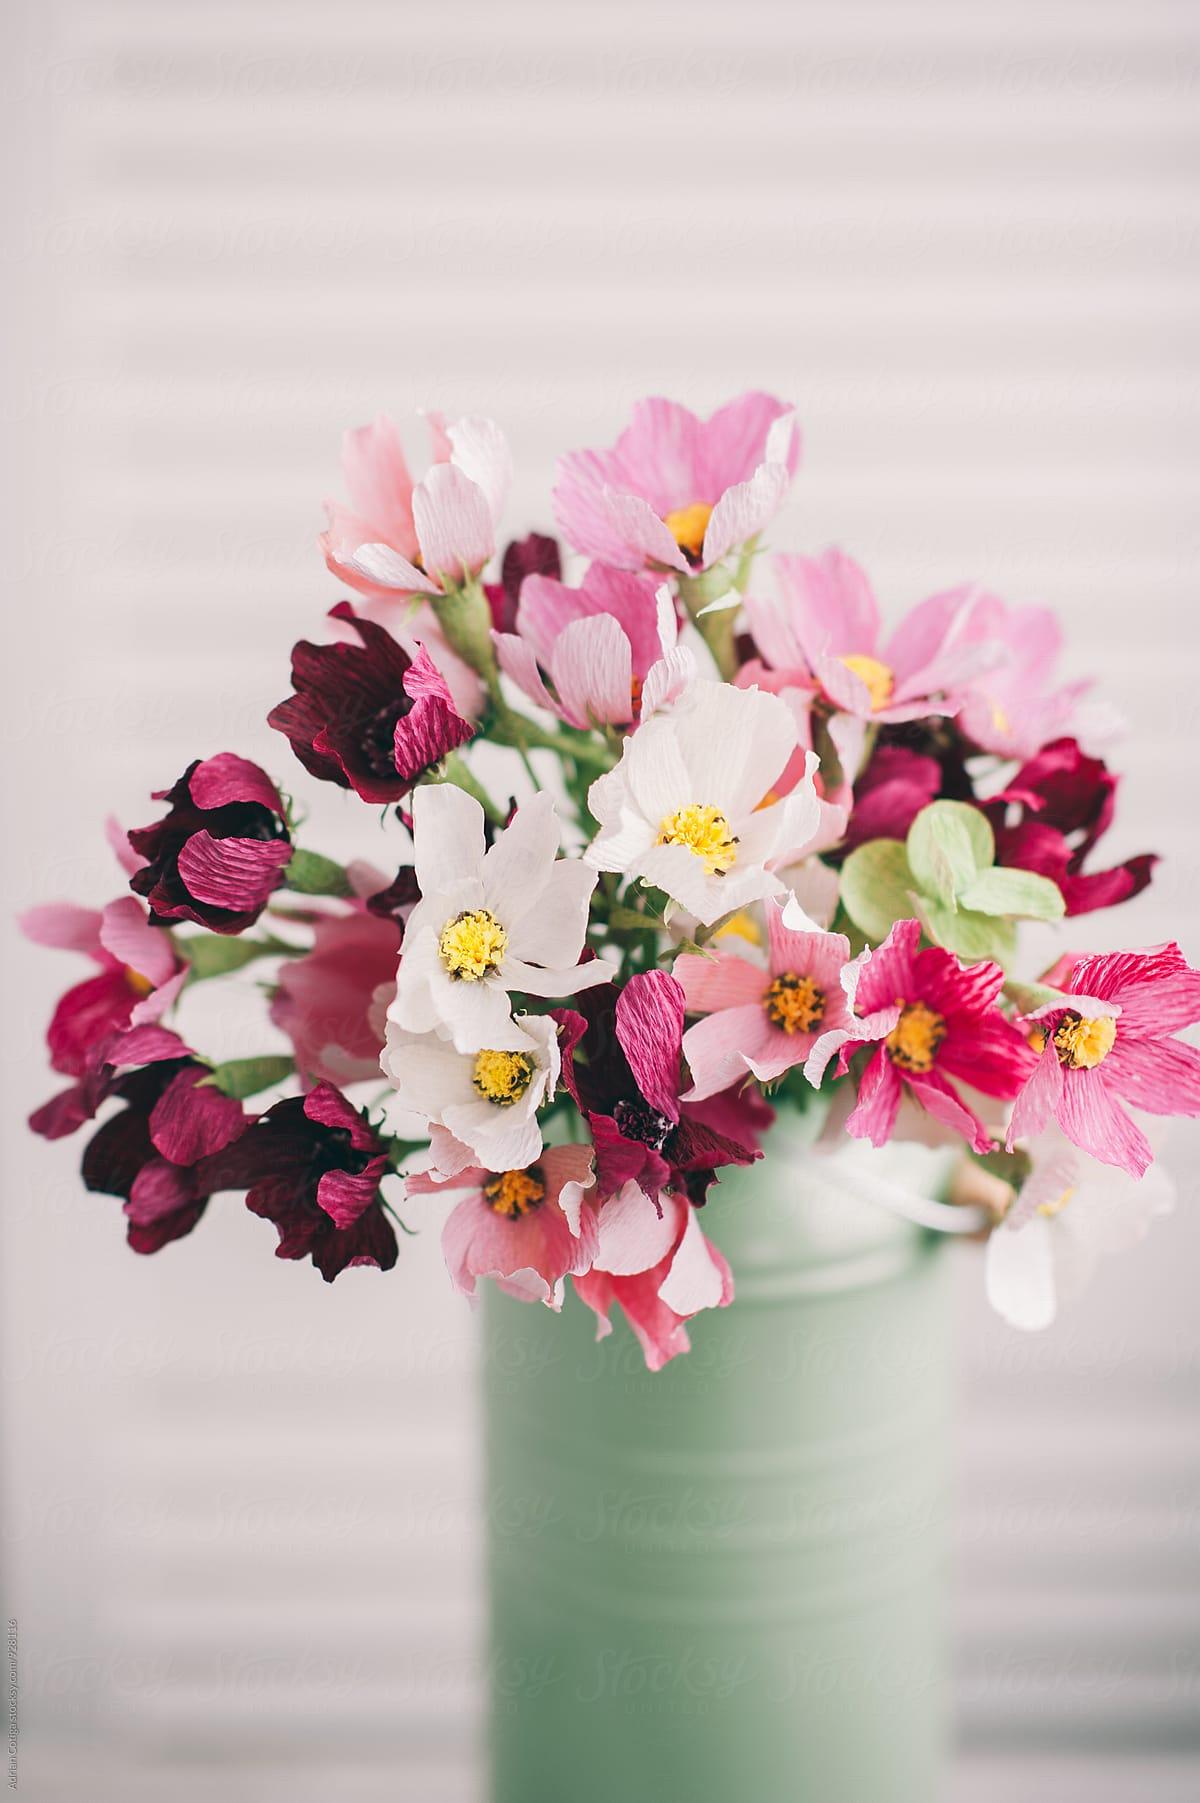 Delicate Paper Flowers Bouquet Stocksy United